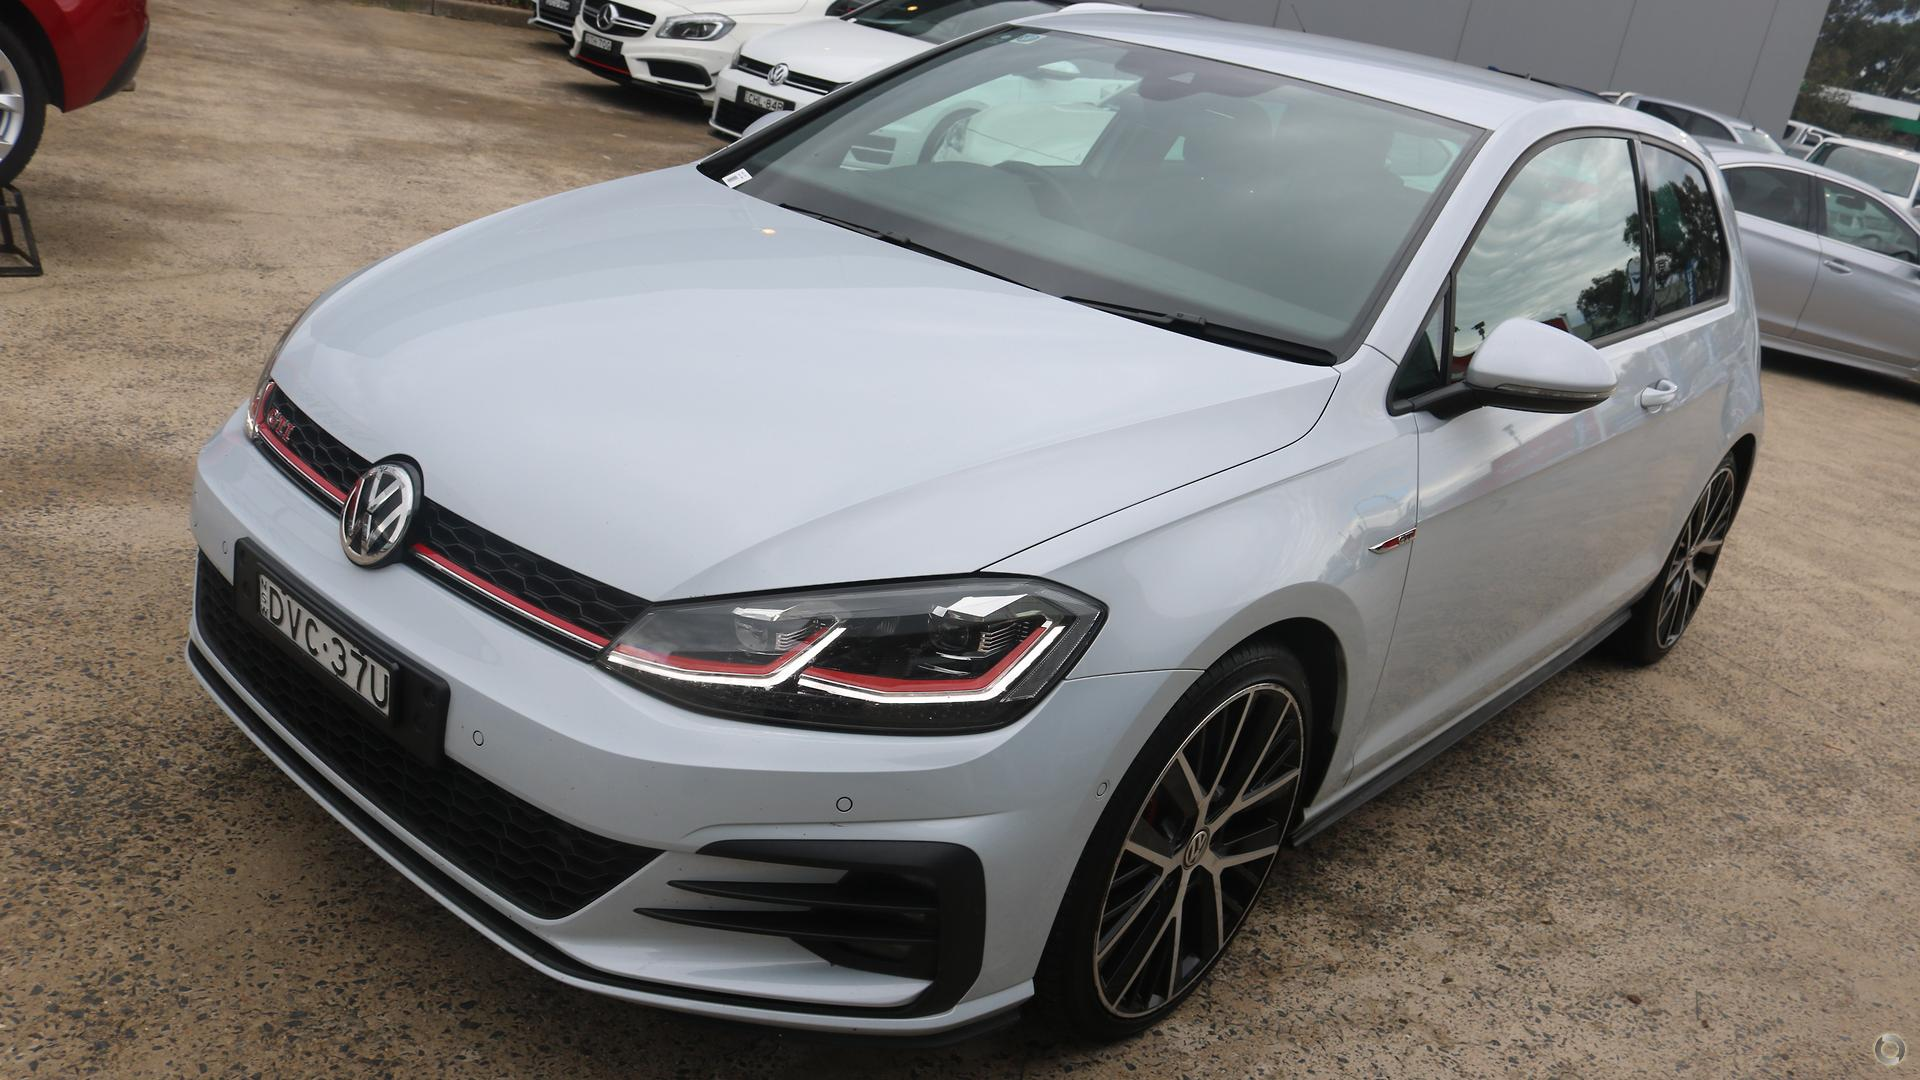 2017 Volkswagen Golf GTI Performance Edition 1 7.5